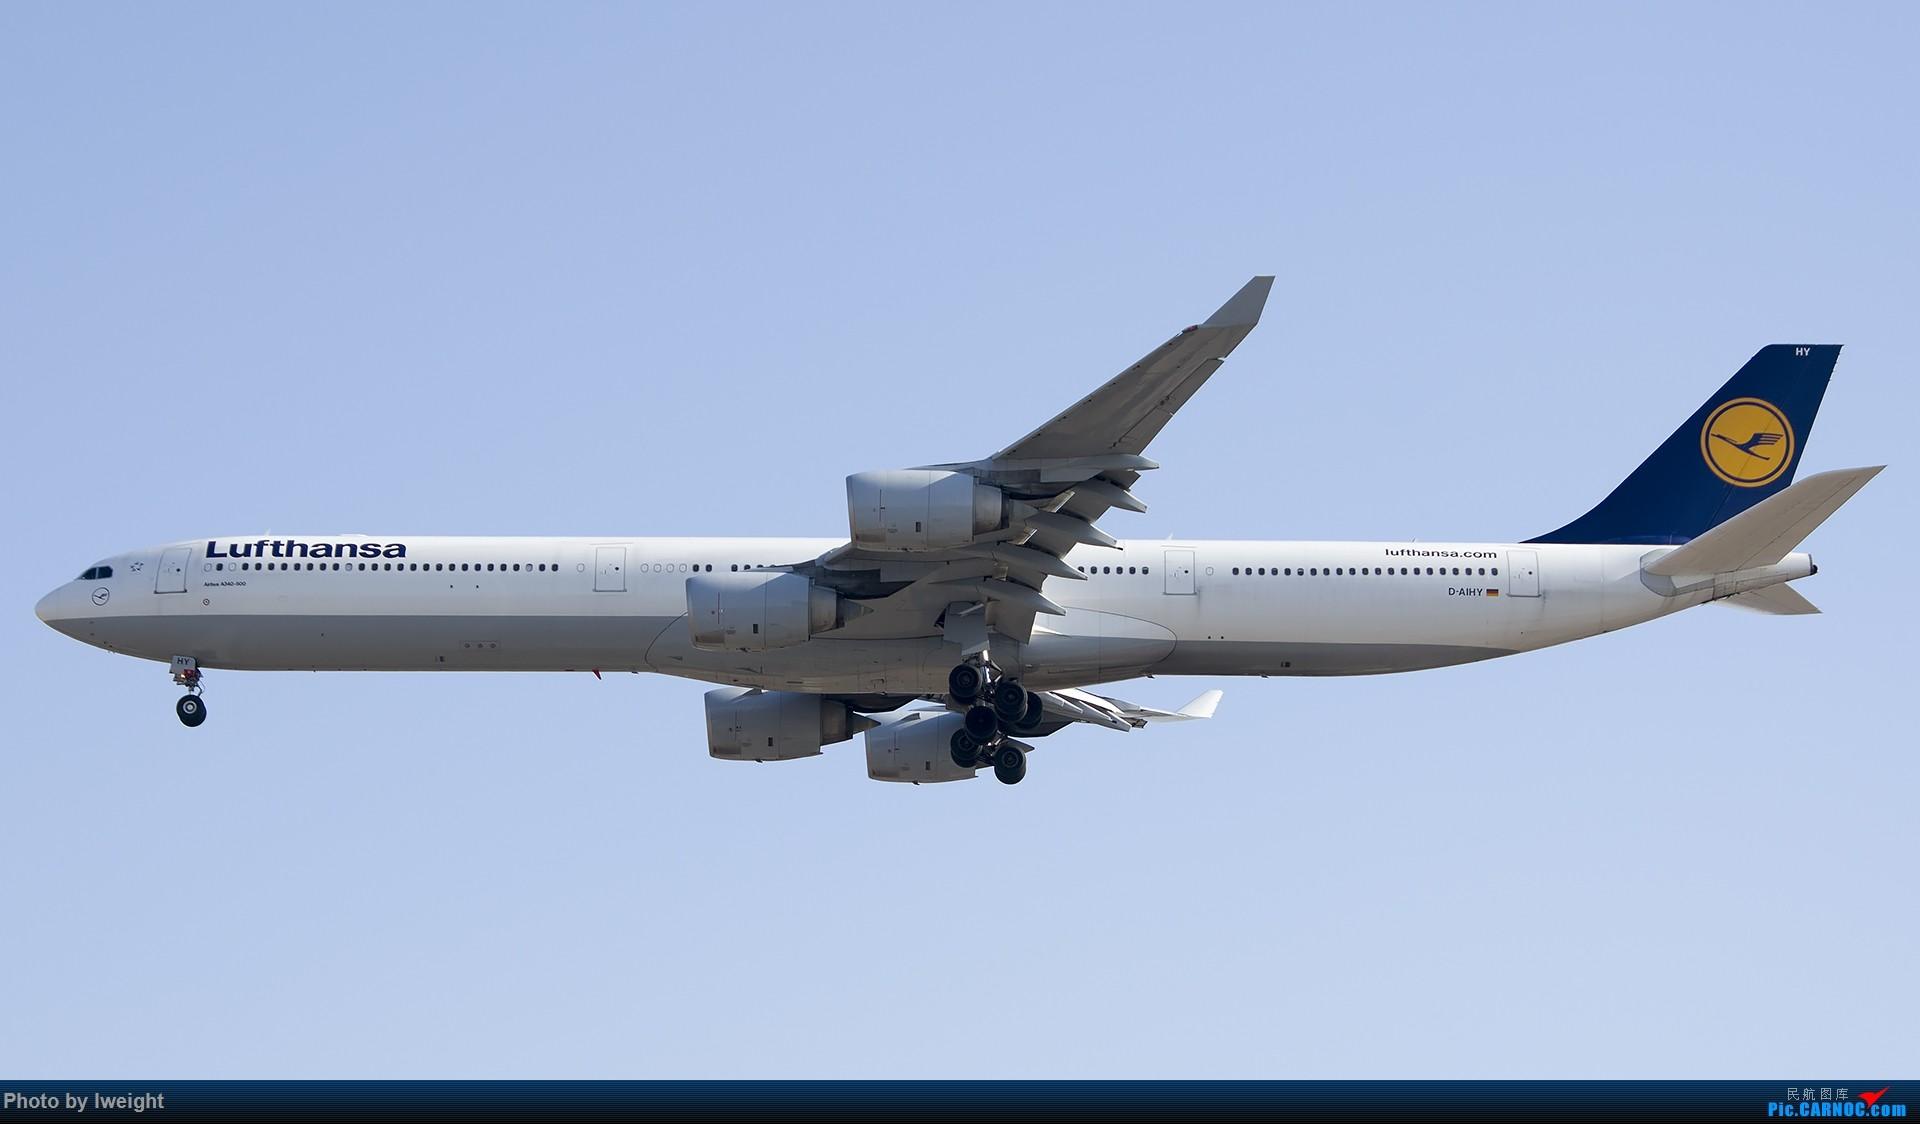 Re:[原创]庆祝升级777,发上今天在首都机场拍的所有飞机【2014-12-14】 AIRBUS A340-600 D-AIHY 中国北京首都国际机场